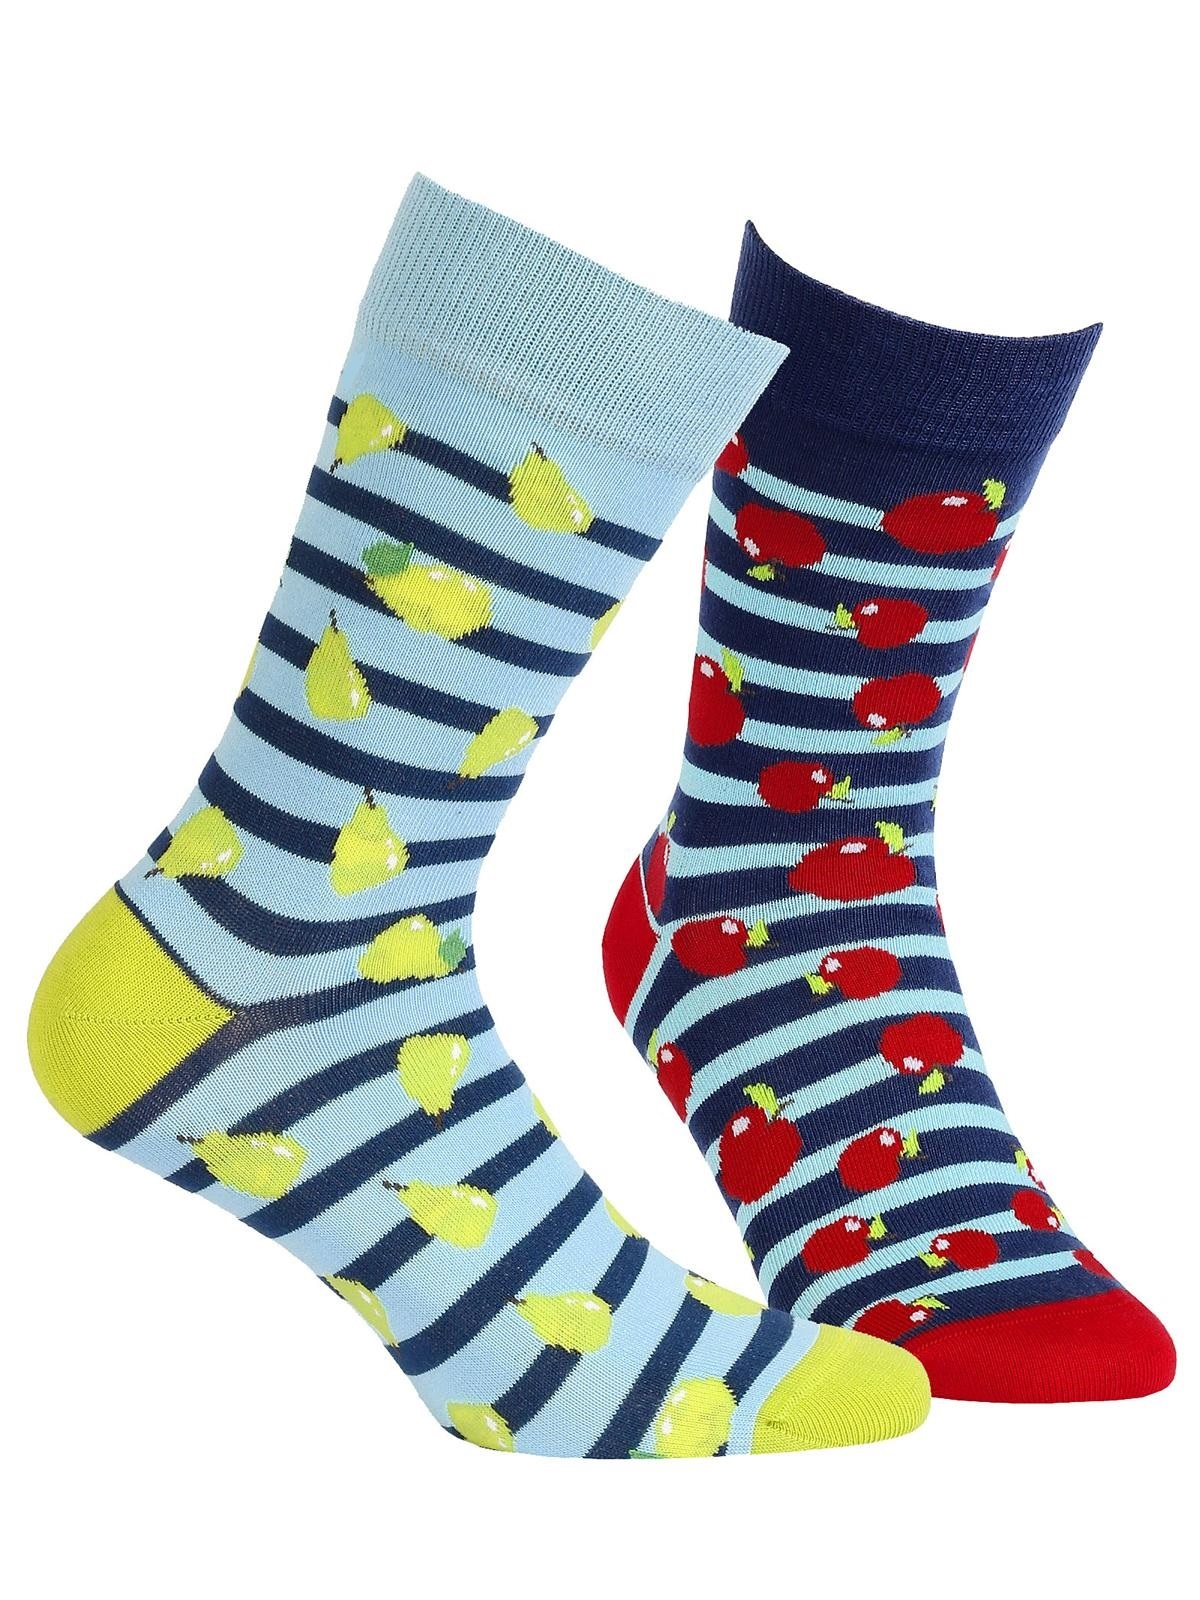 Картинка пара носков или